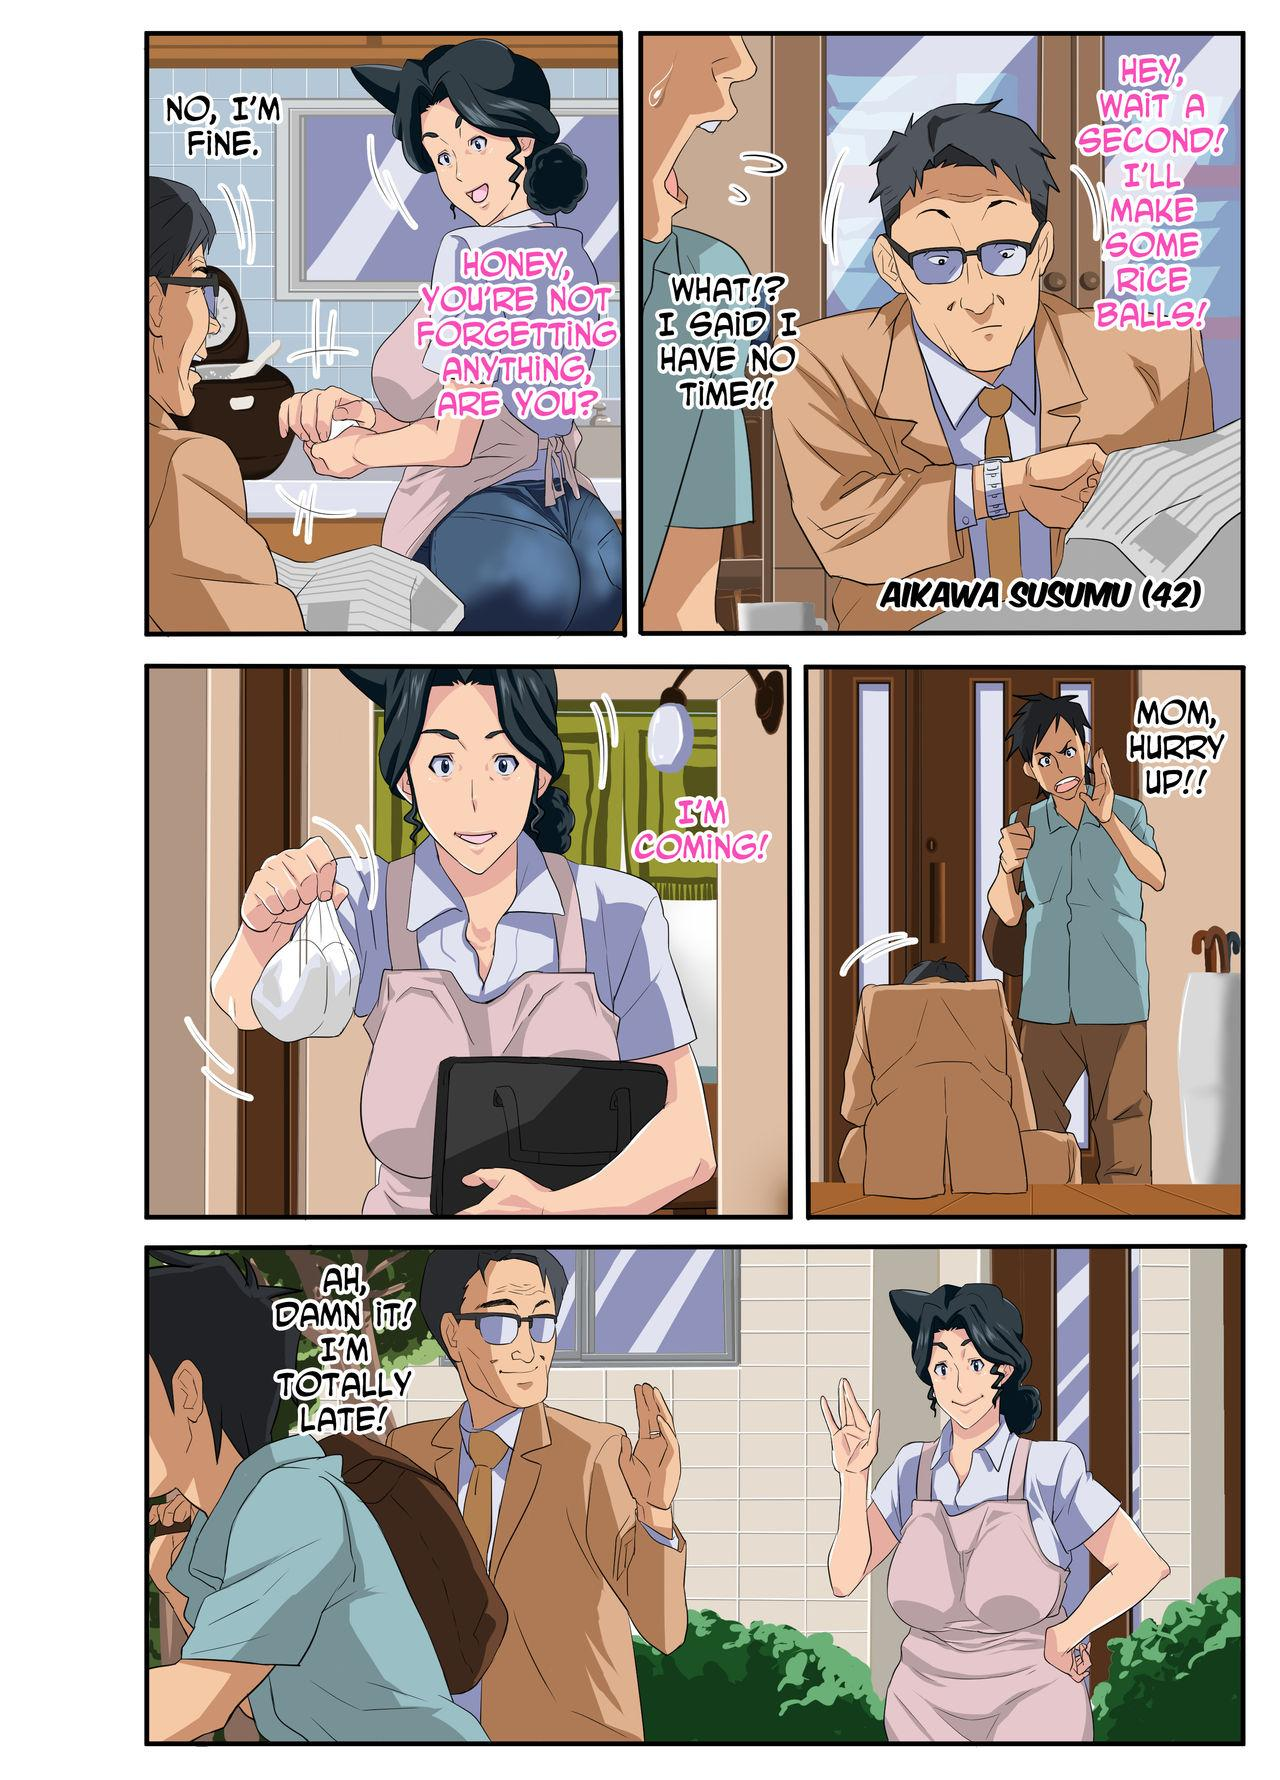 [Mosquito Man] Zoku Kimottama Kaa-chan to Charao ~Yaribeya Hen~ | Continuation: Daring Mom & Playboy -Fuck Room Chapter- [English] [N04h] 2